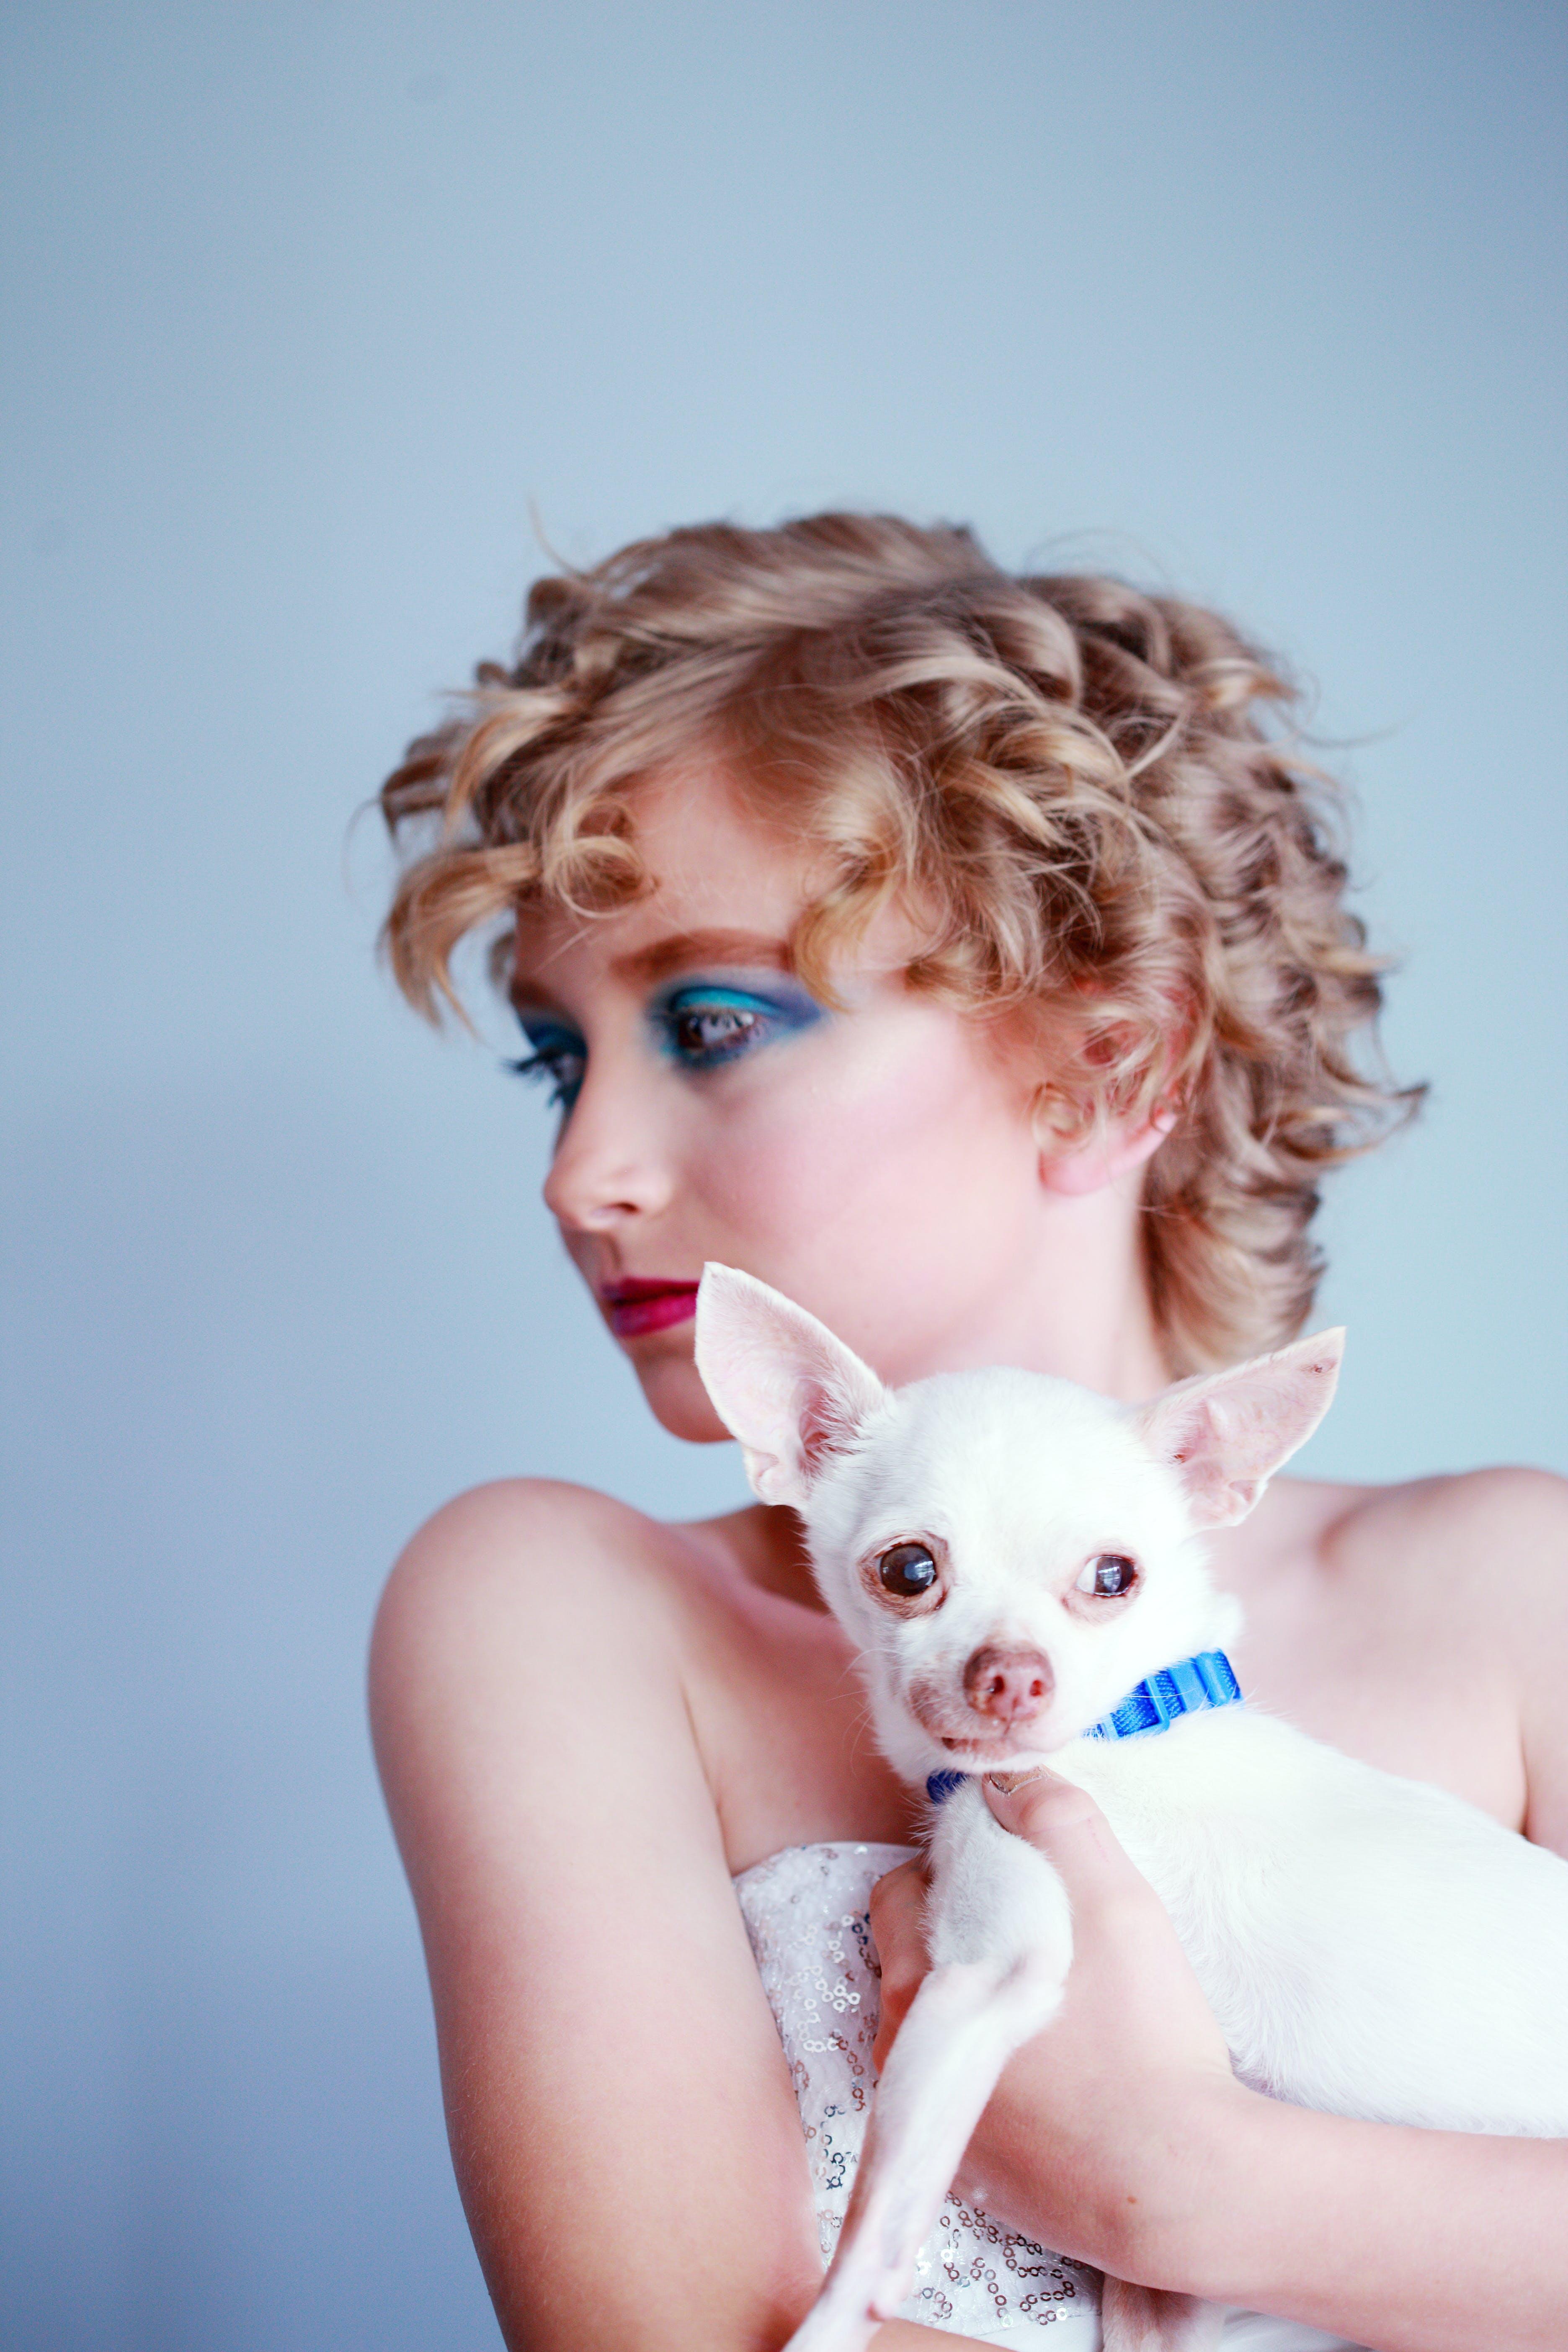 Gratis lagerfoto af blondine, chihuahua, dyr, familie